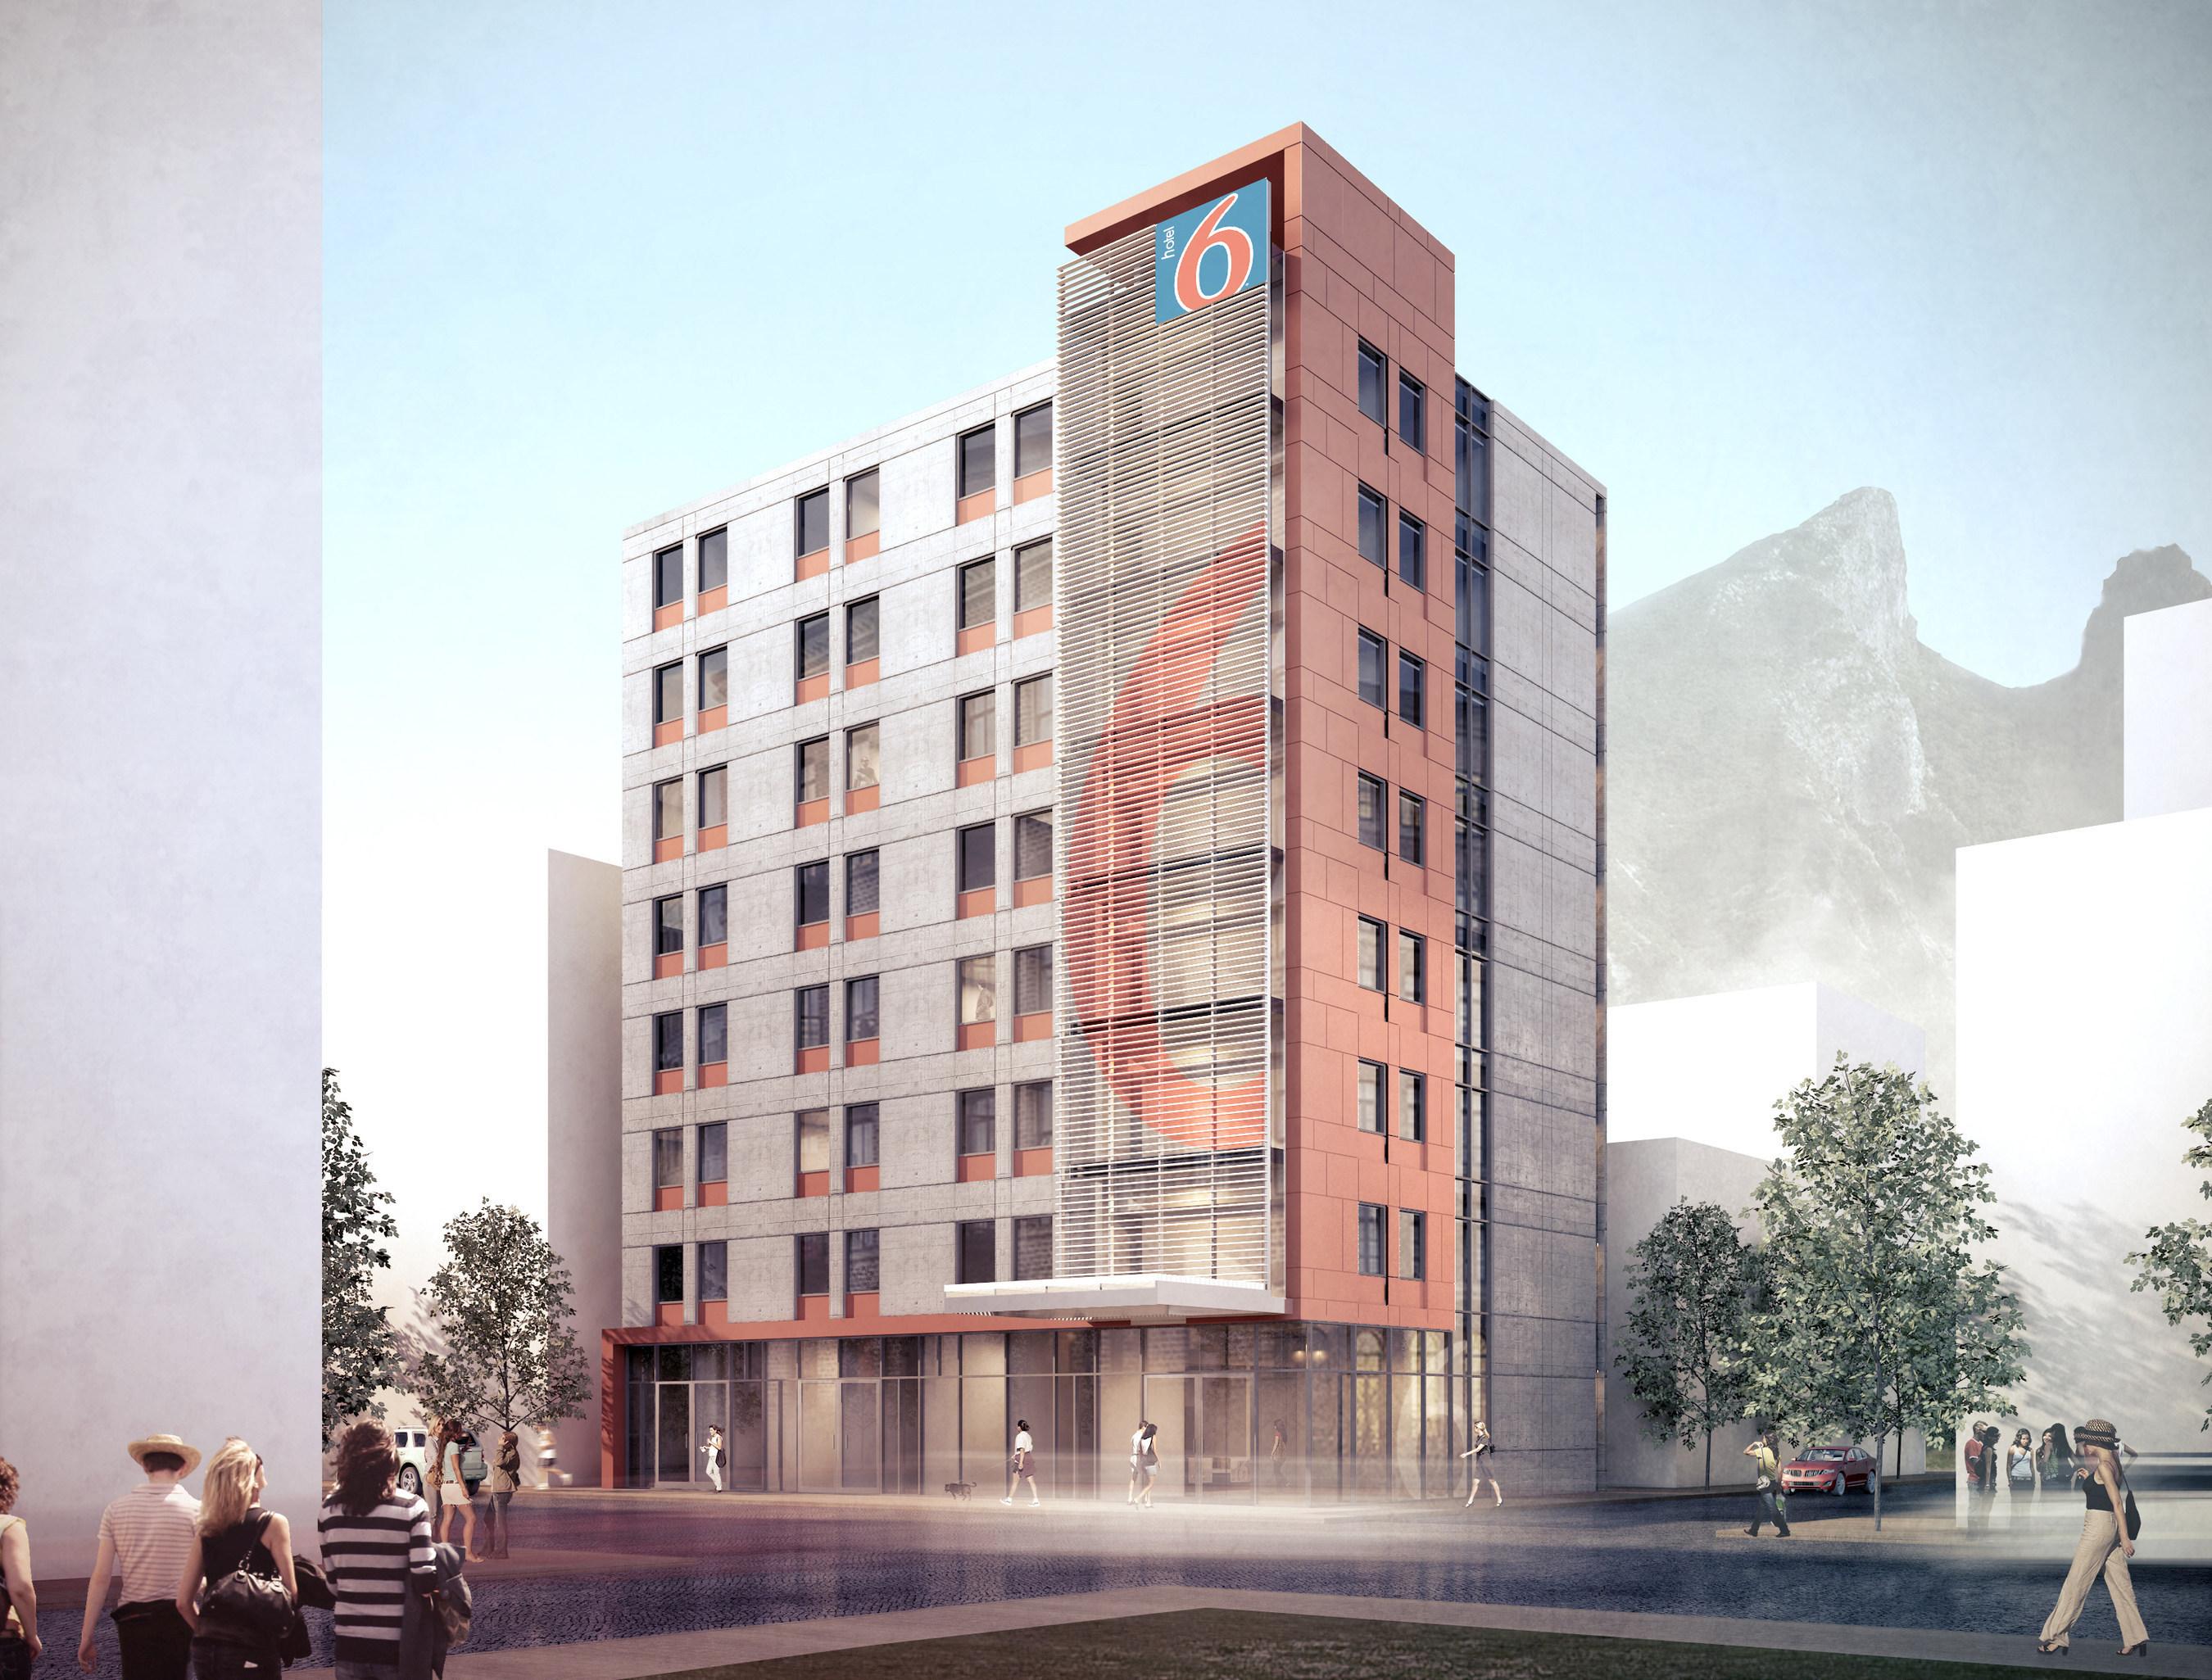 Rendering of Hotel 6 Prototype